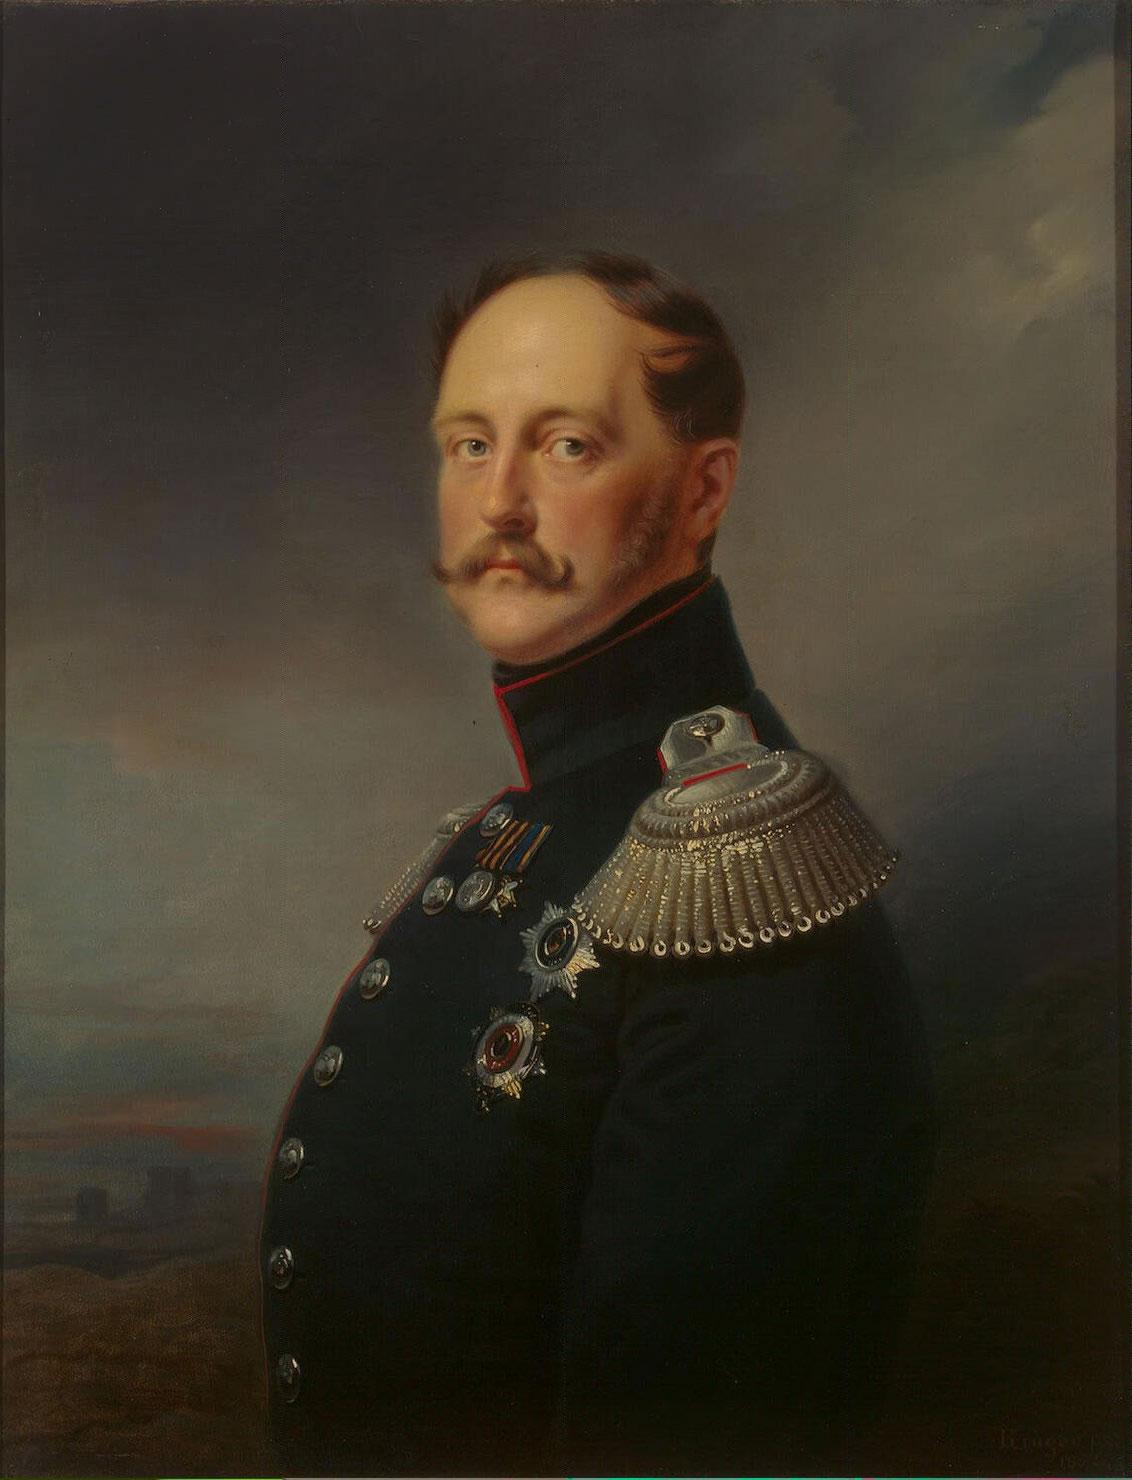 Russian Tsar Nicholas I Ruled